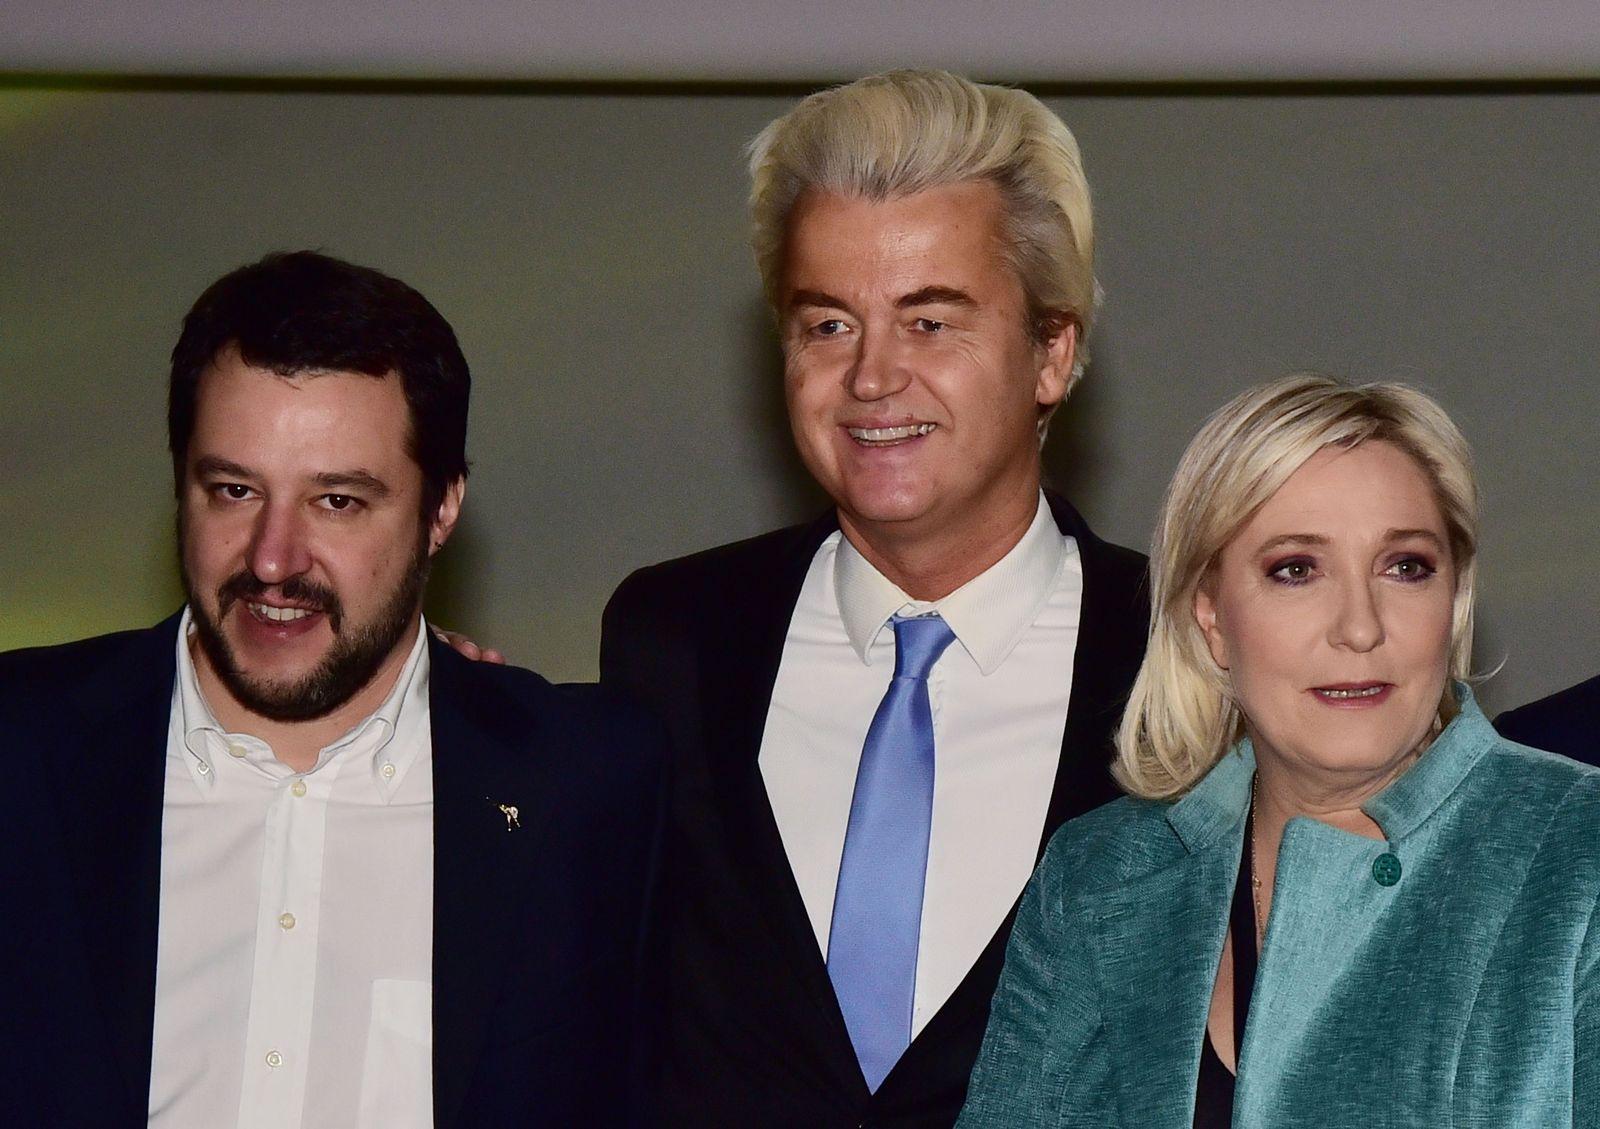 ITALY-ENF-POLITICS